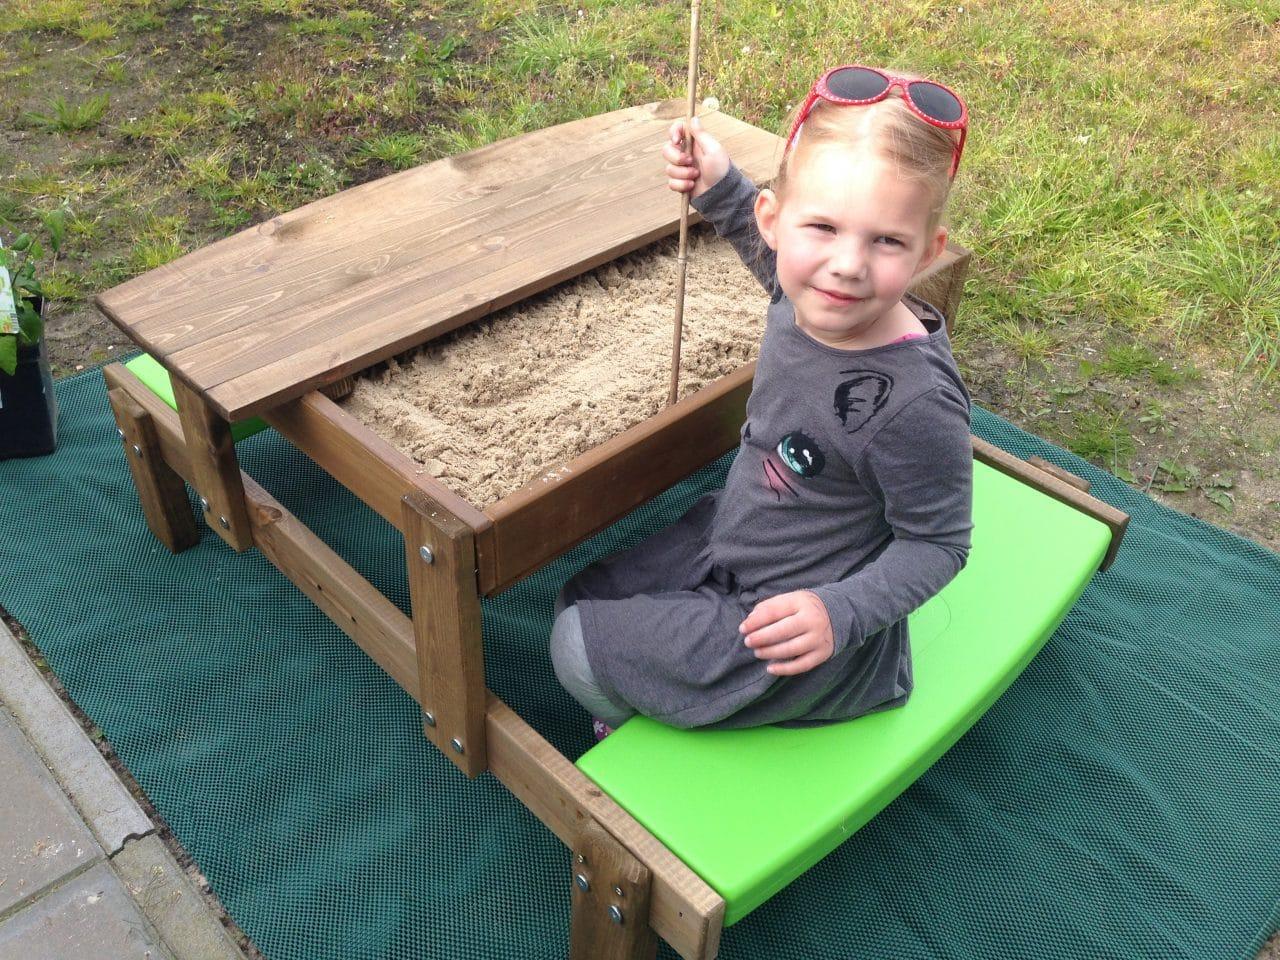 picknick- en zandtafel in één